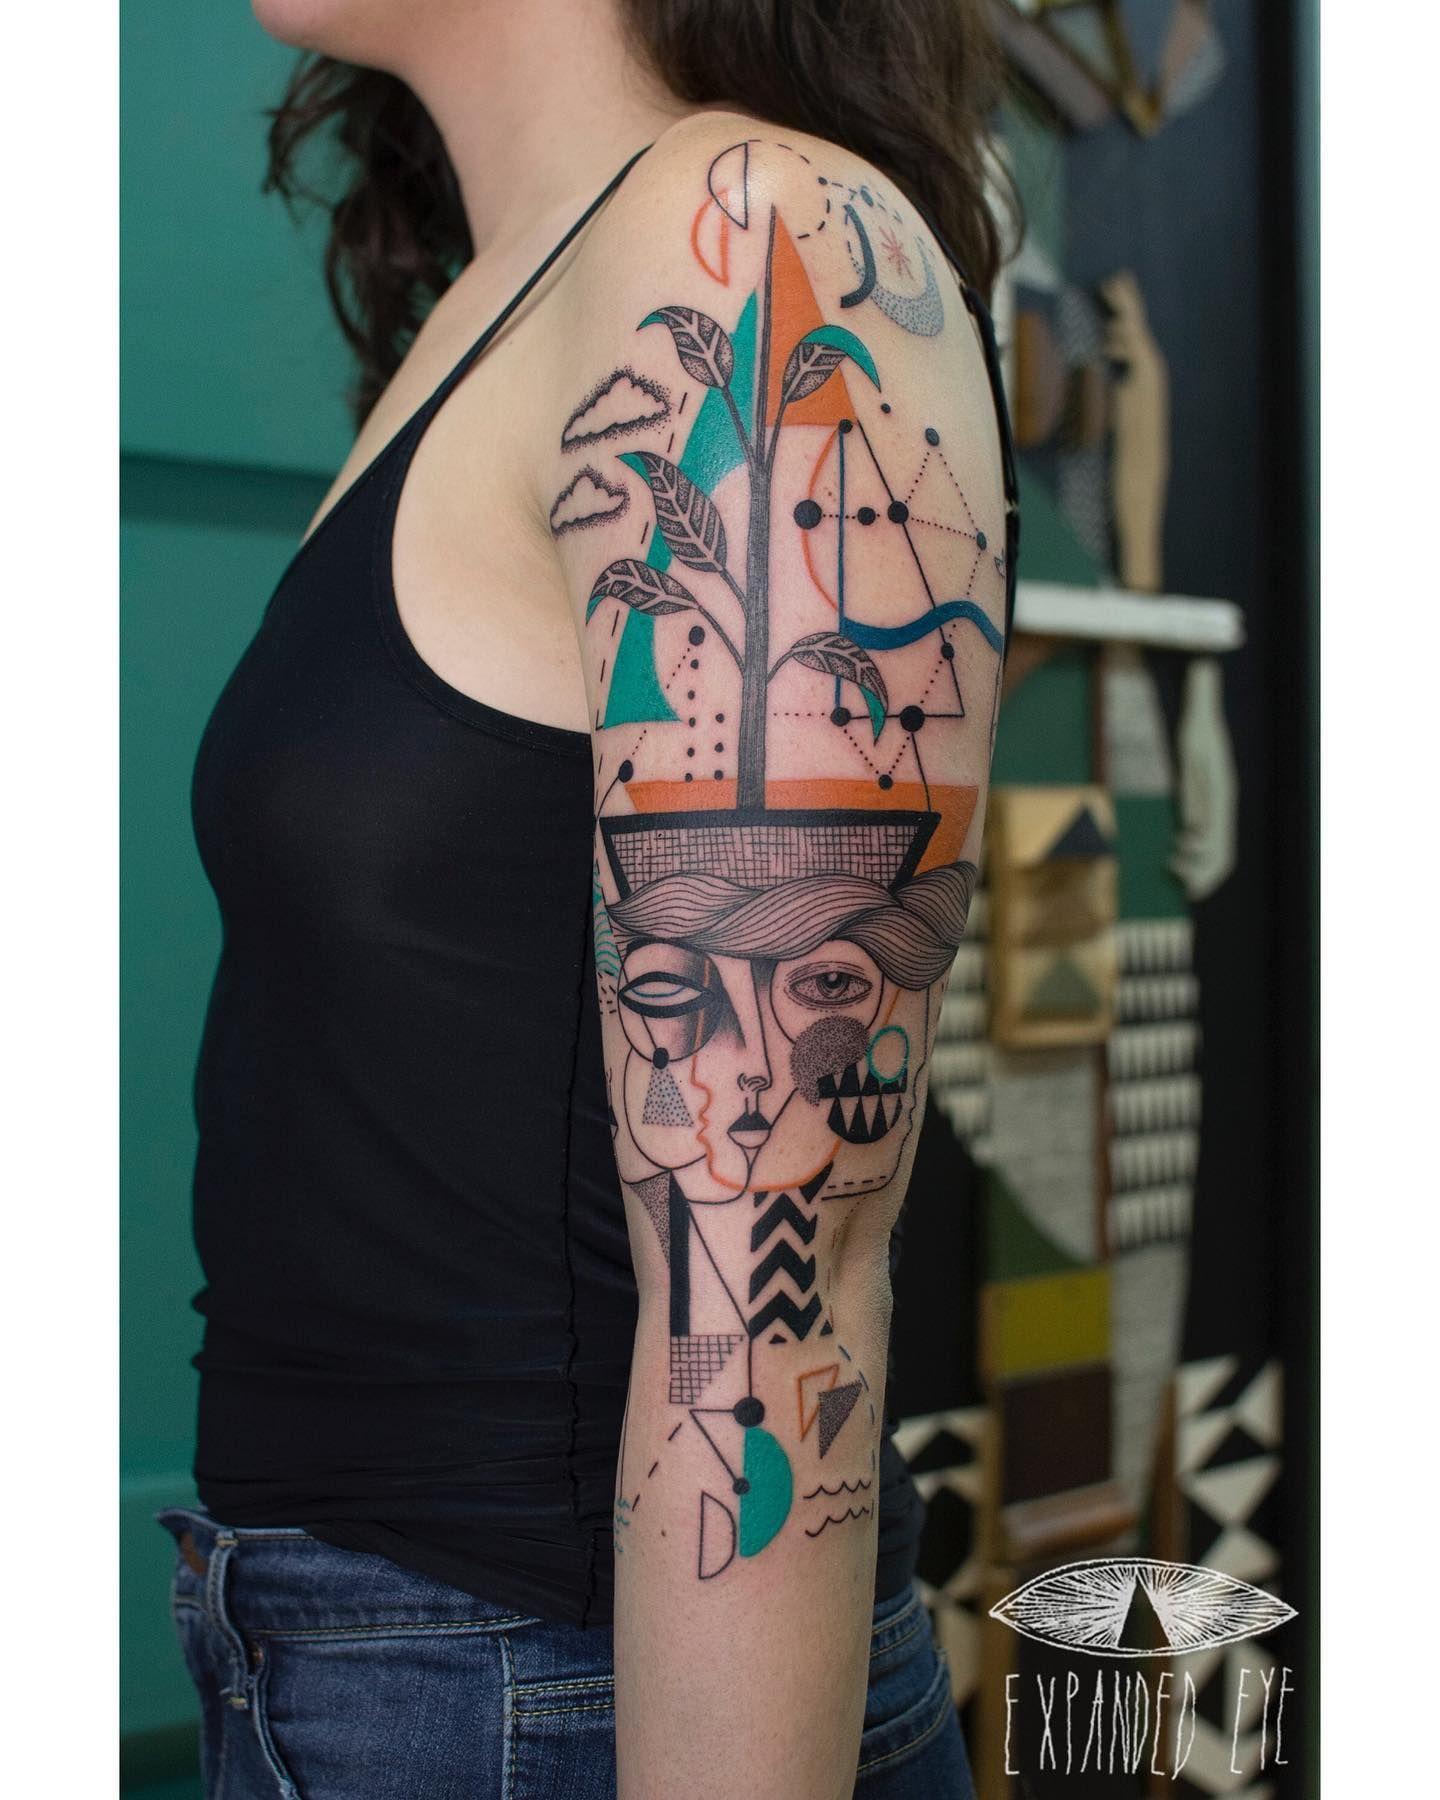 Expanded eye tattoo tattoos geometric watercolor